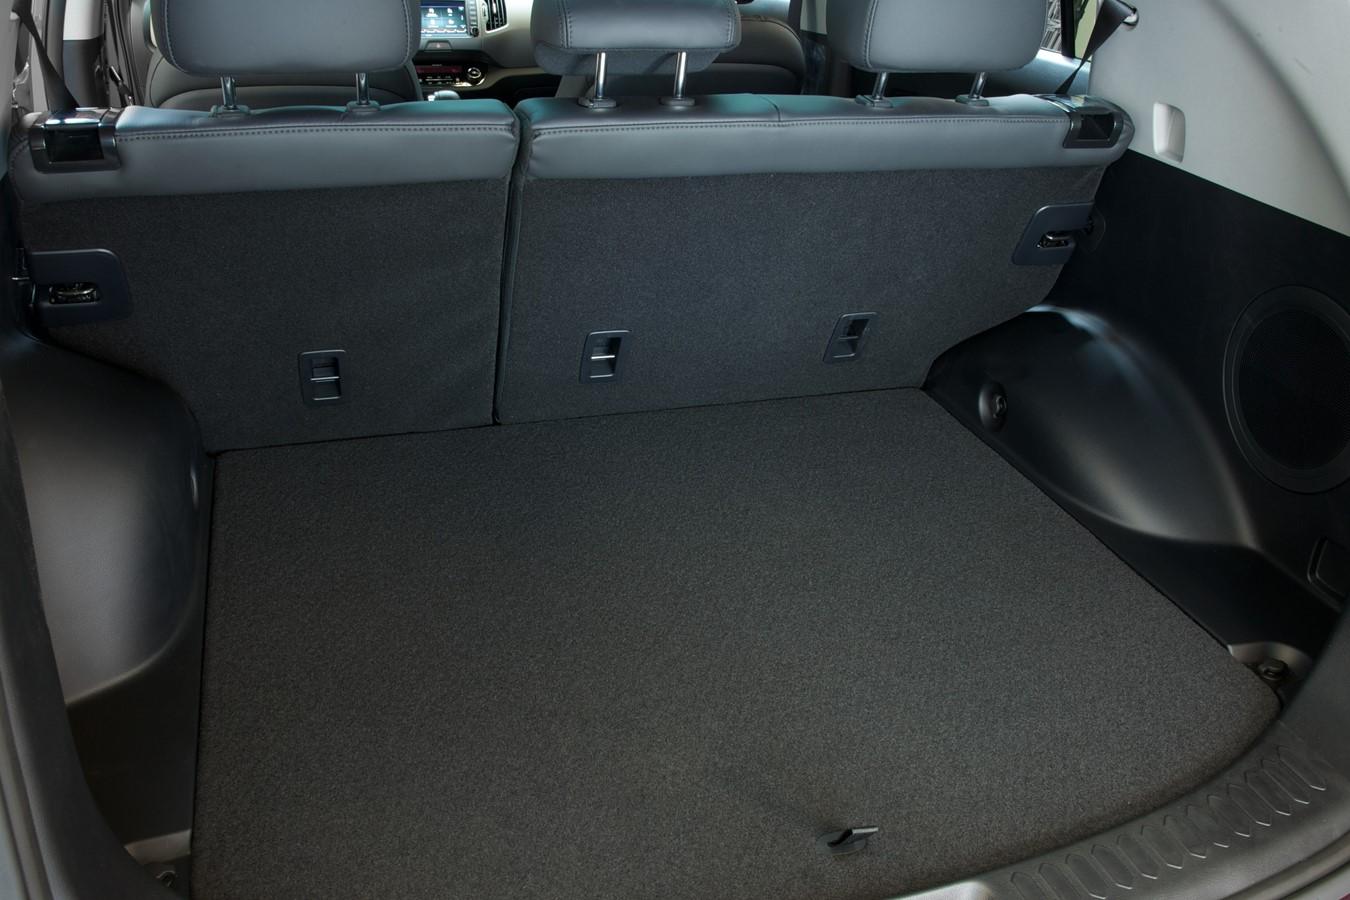 2015 Kia Sportage for lease near Elkhart, Indiana